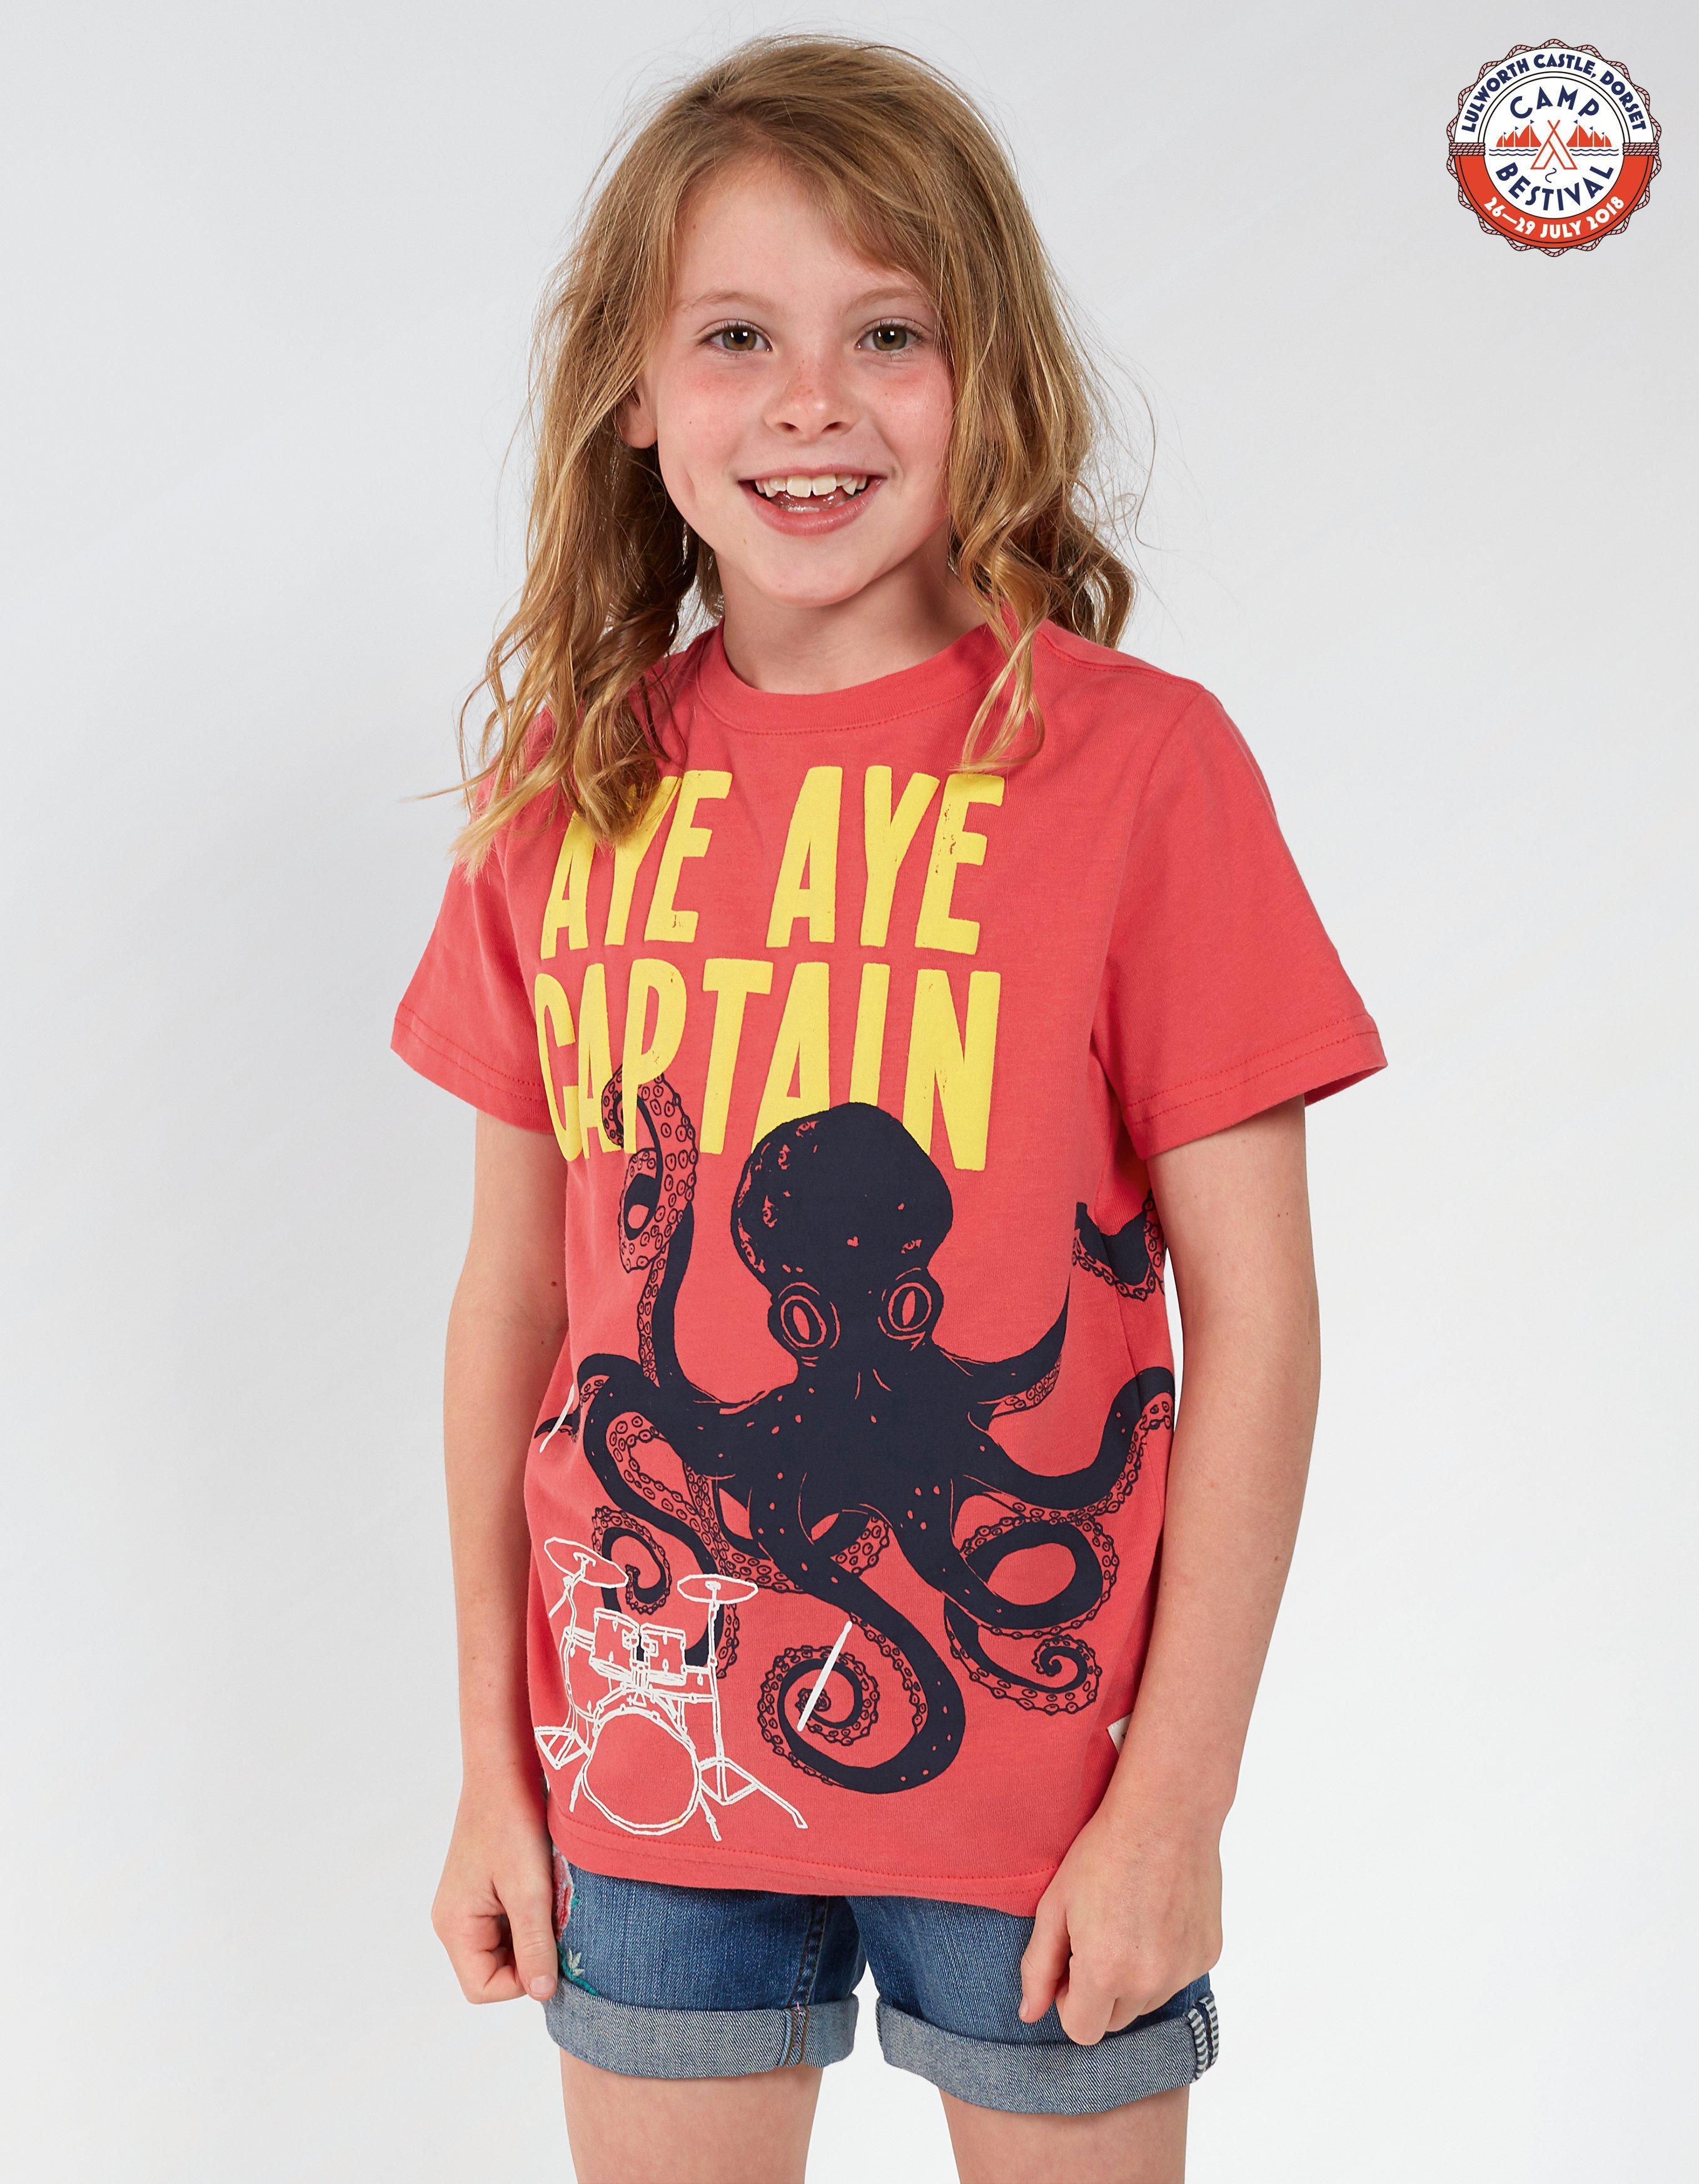 Aye Aye Camp Bestival T-Shirt